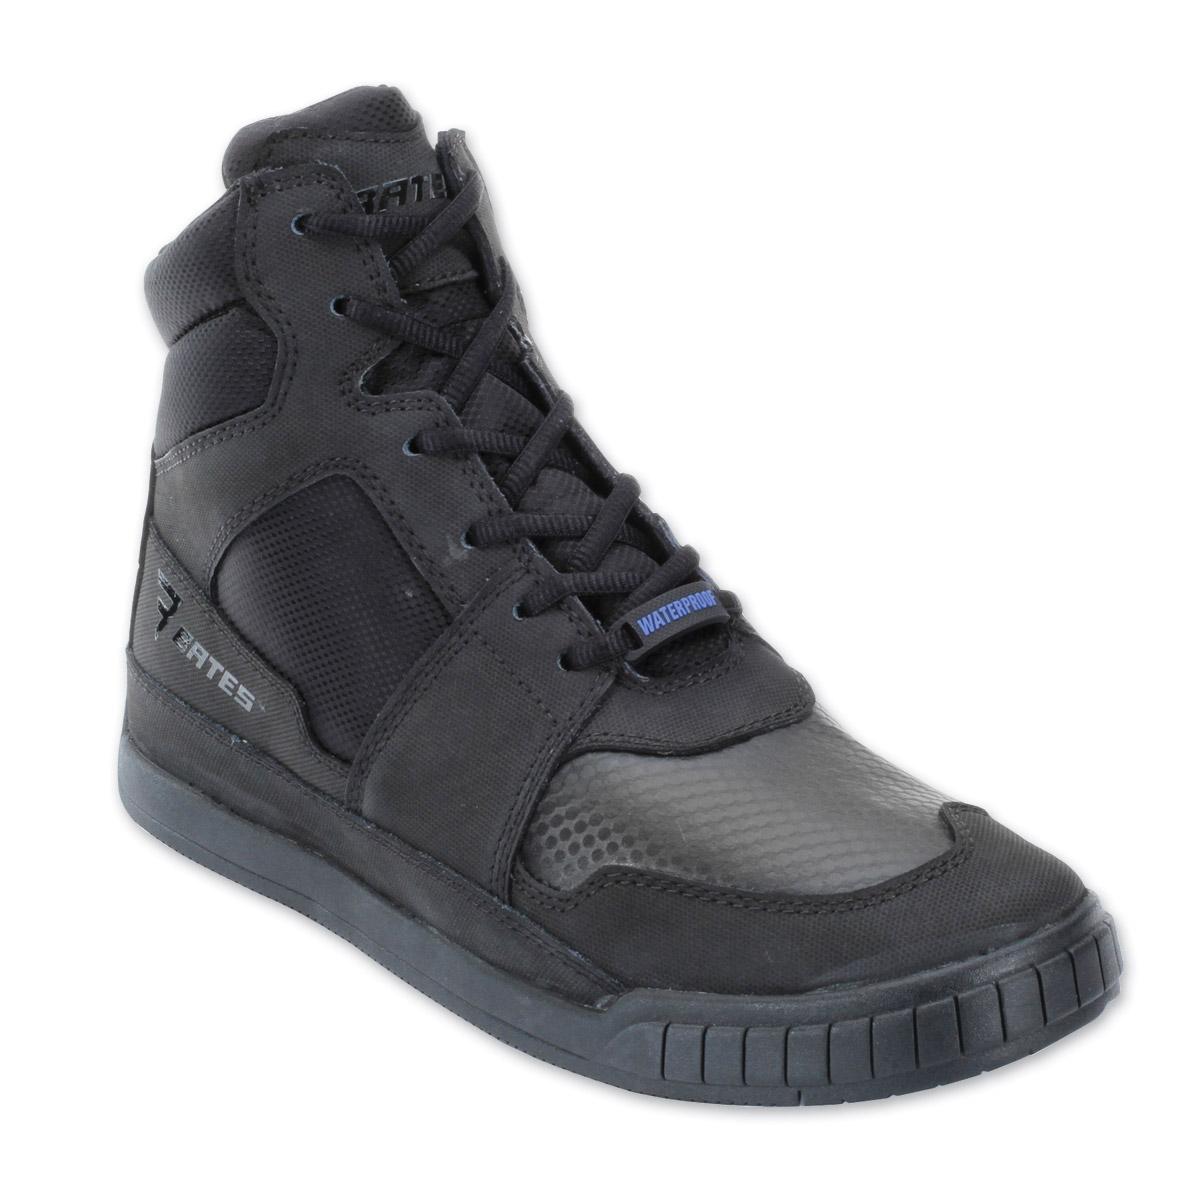 Bates Men's Marauder Black Leather/Nylon Boots